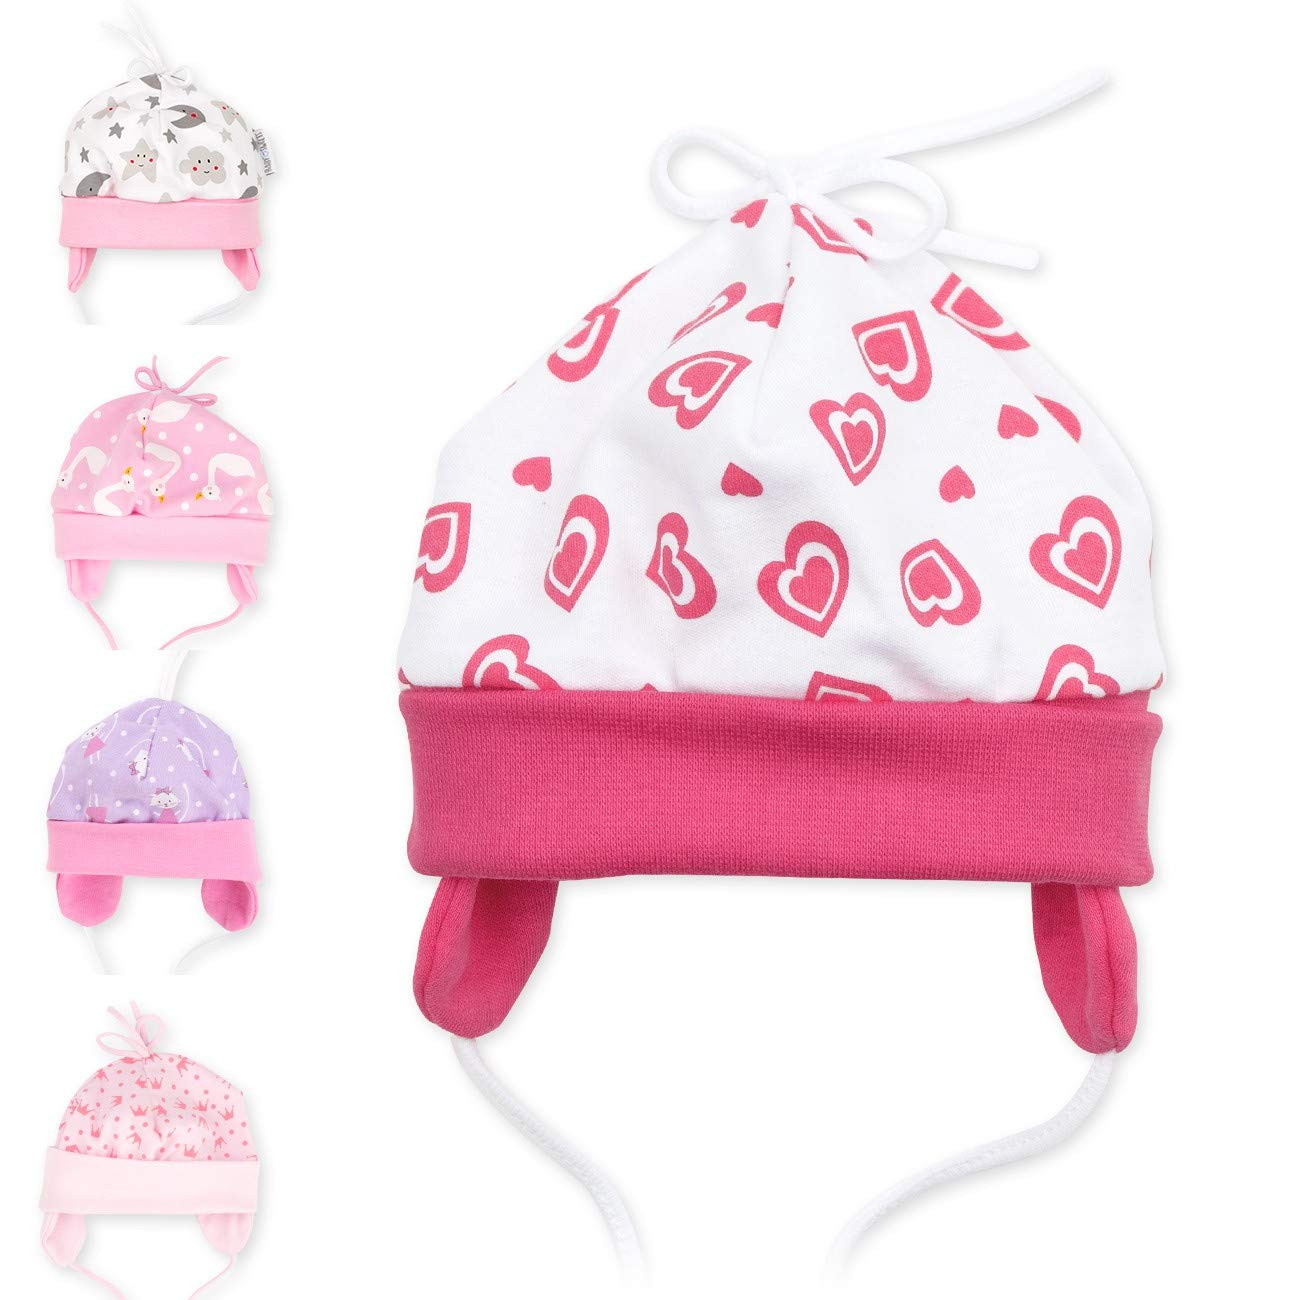 68 Baby Sweets ni/ña gorro blanco rosa Sweet Heart Talla:6 Monate